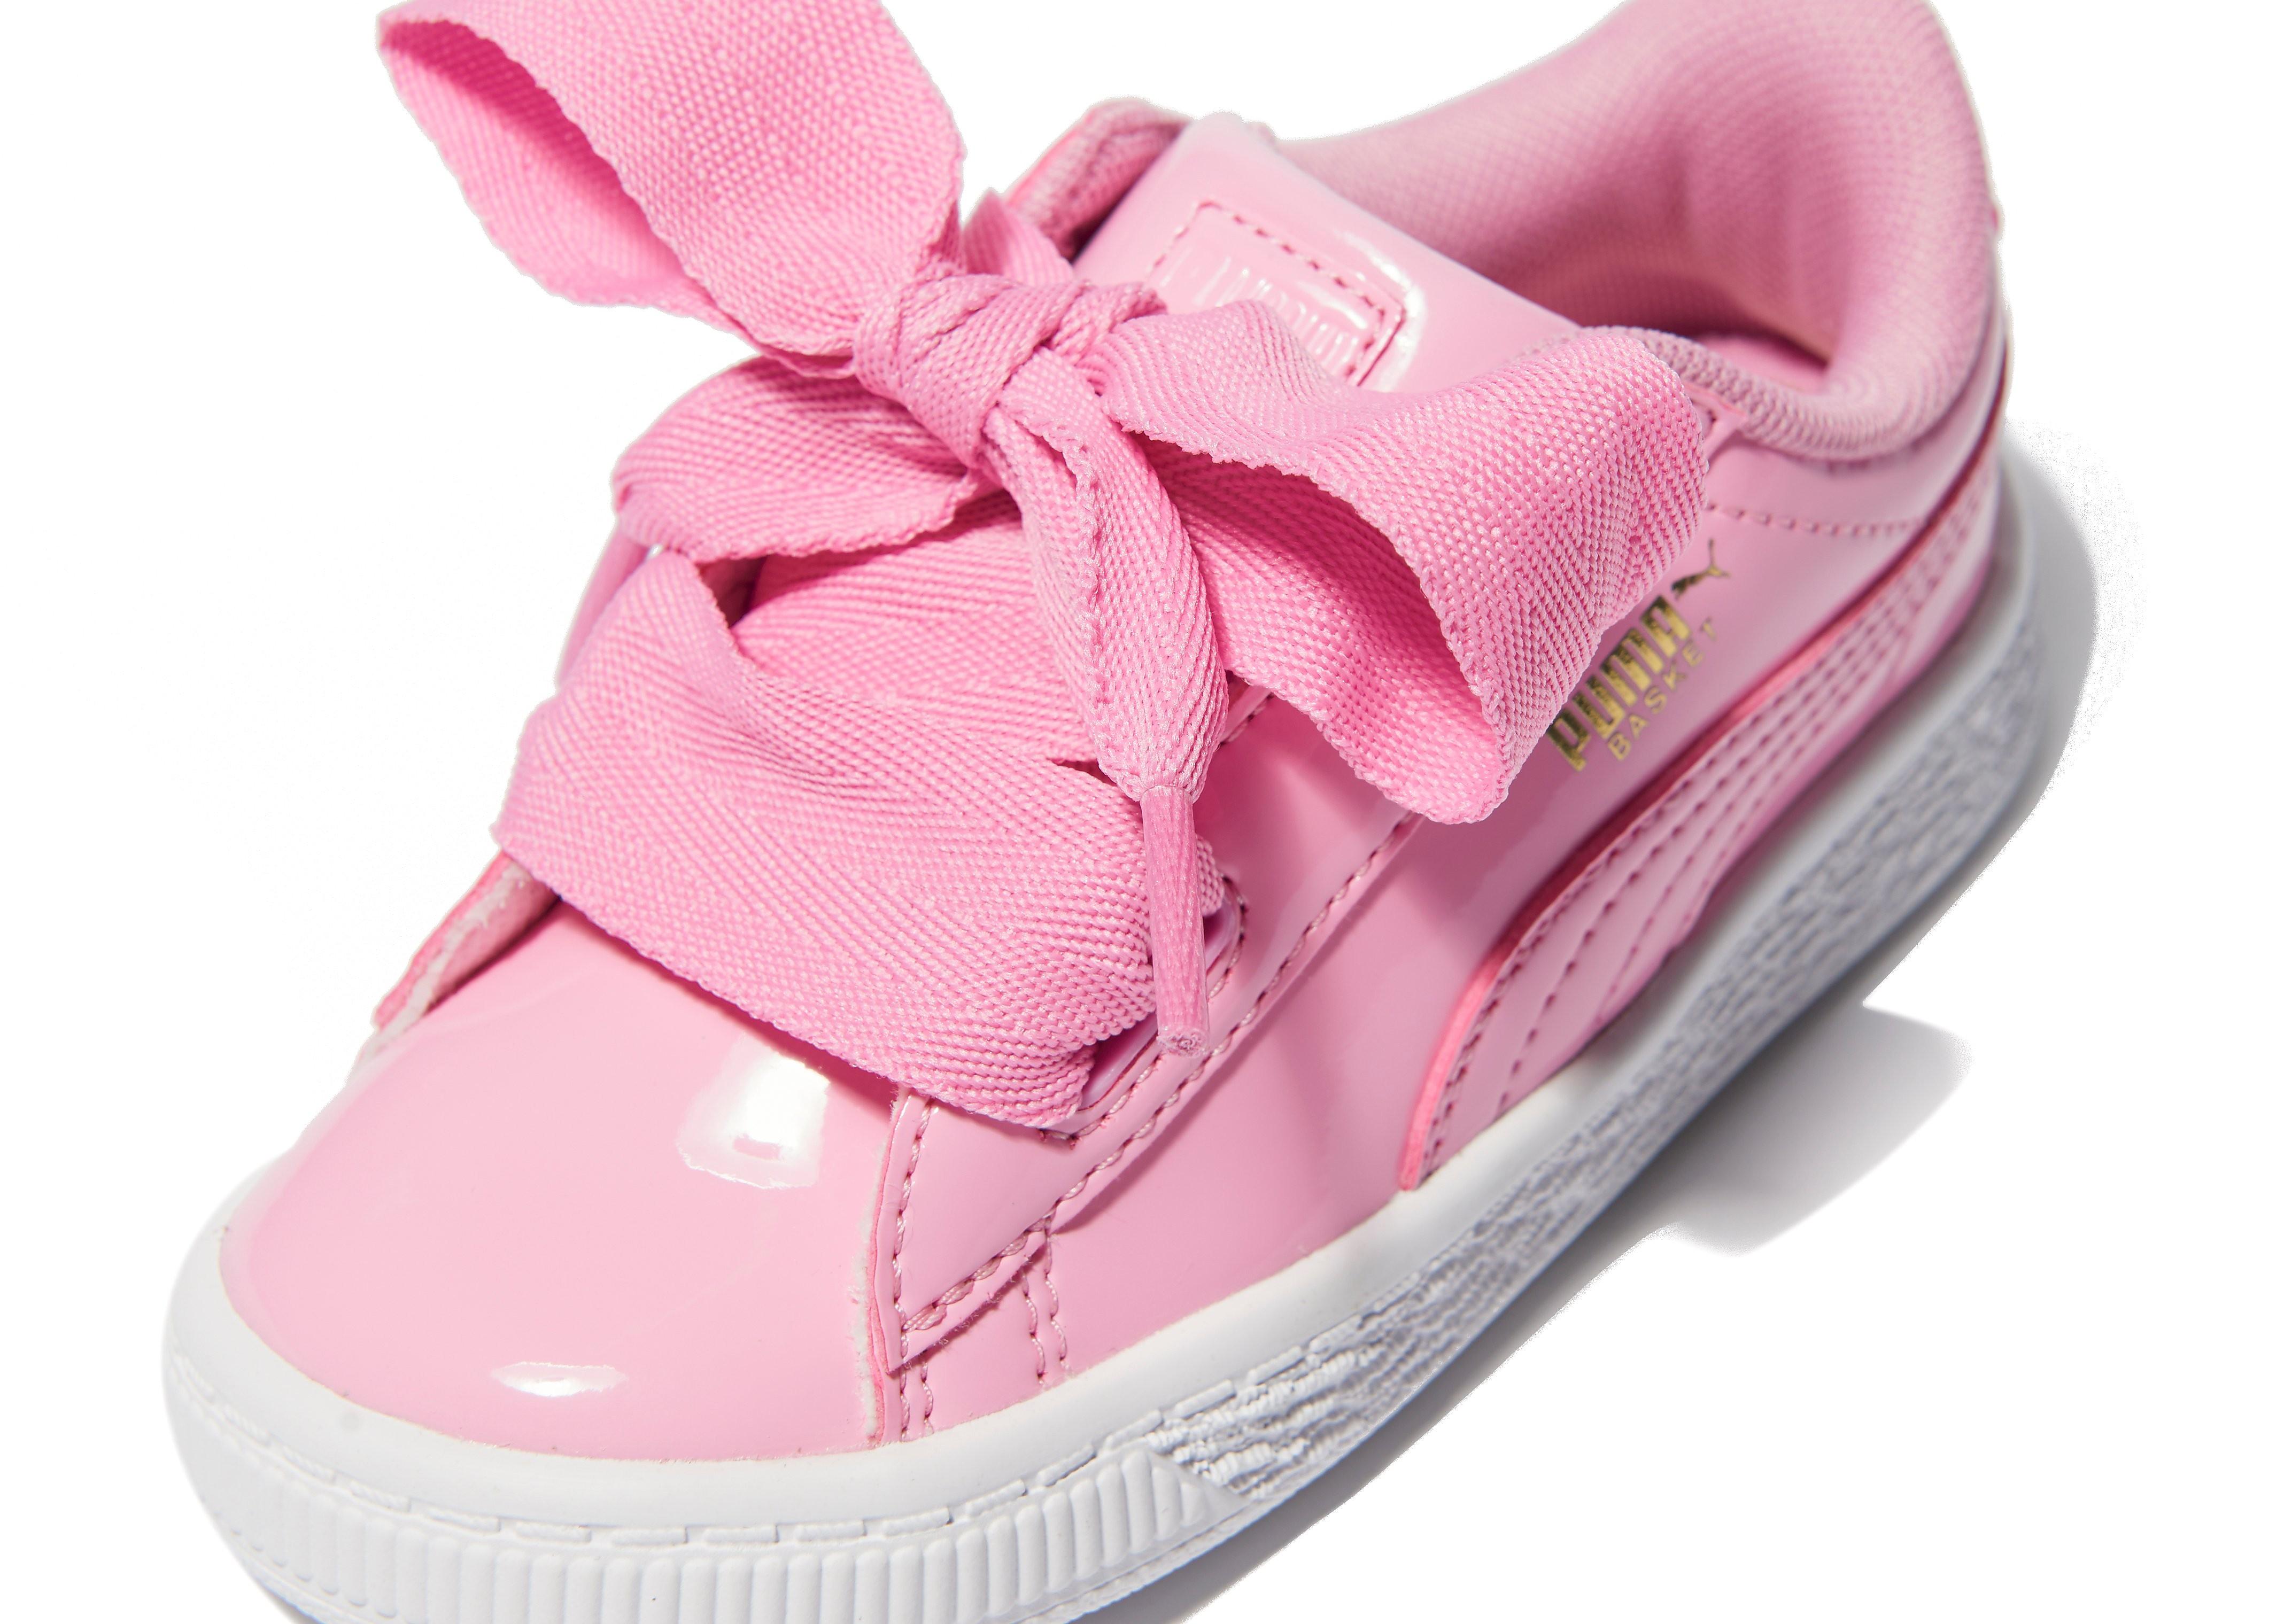 PUMA Basket Hearts Infant